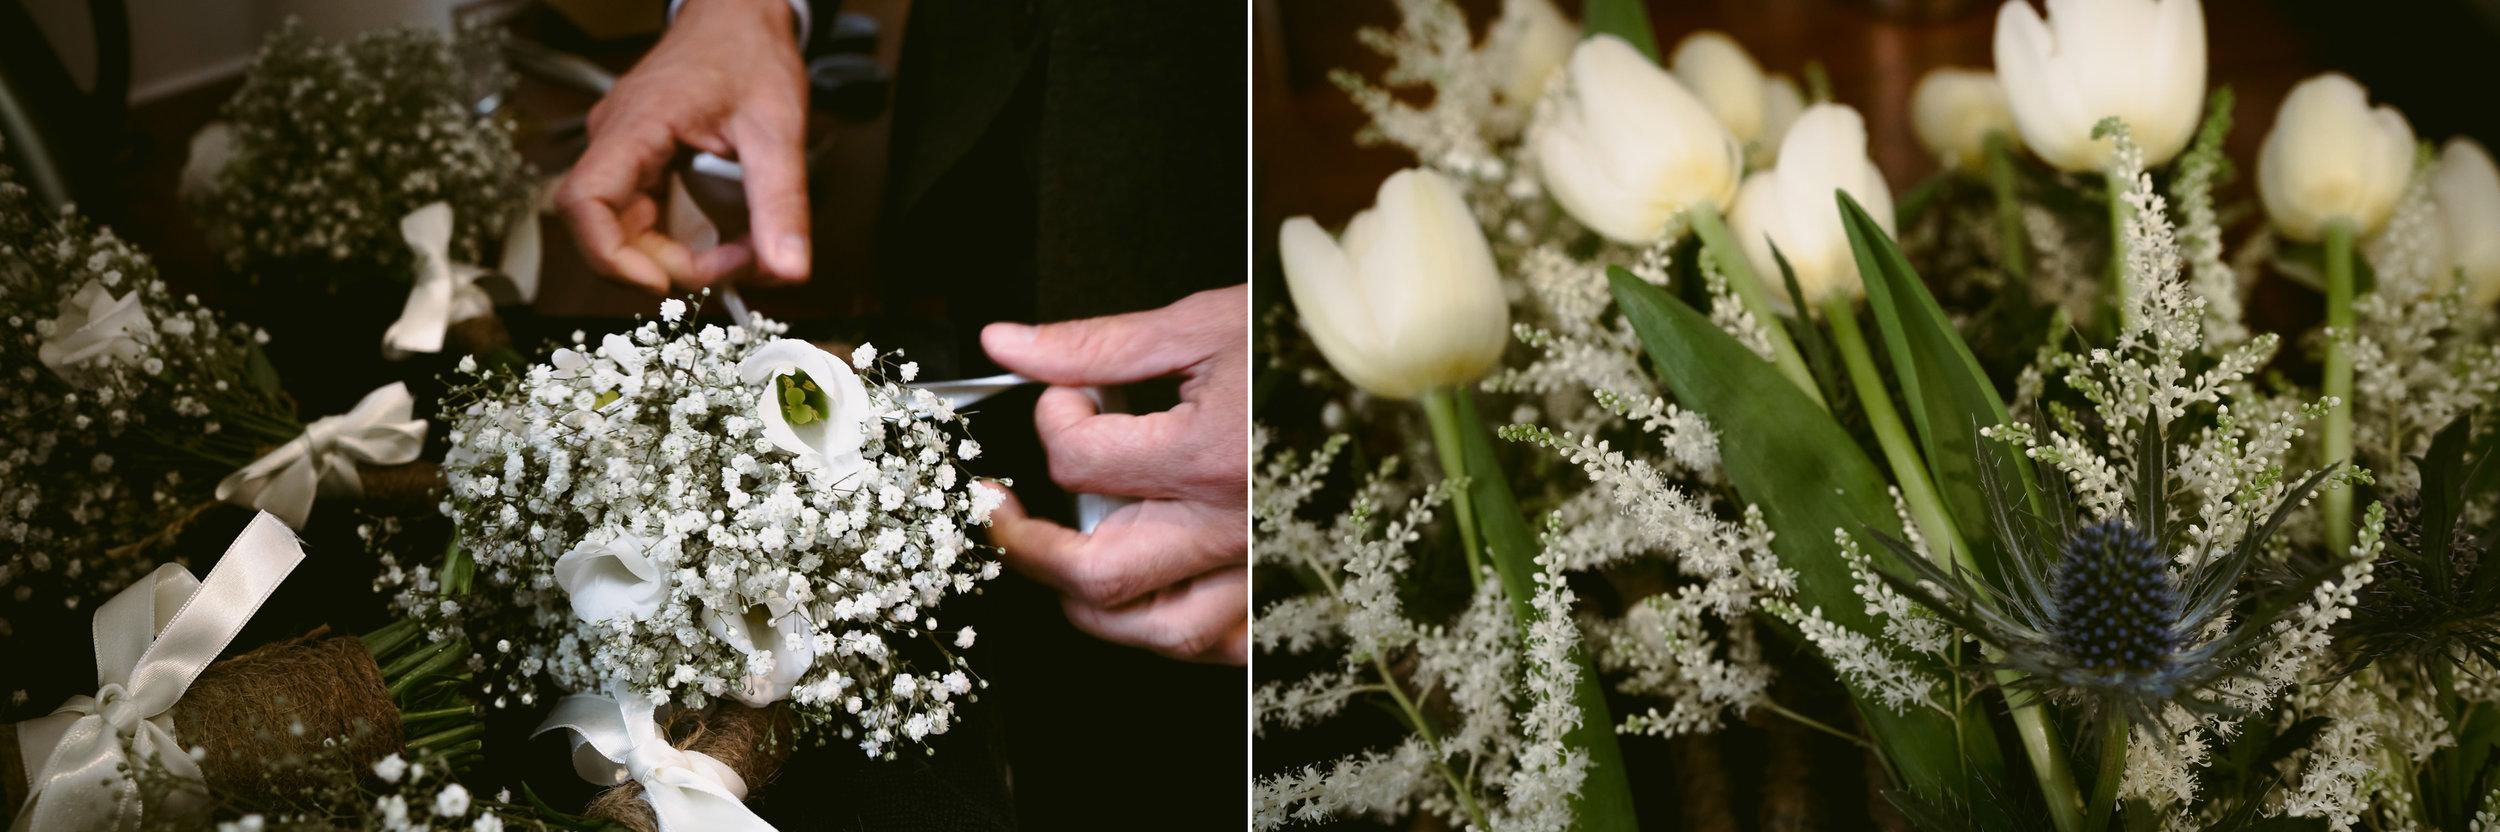 amsterdam wedding photography flowers